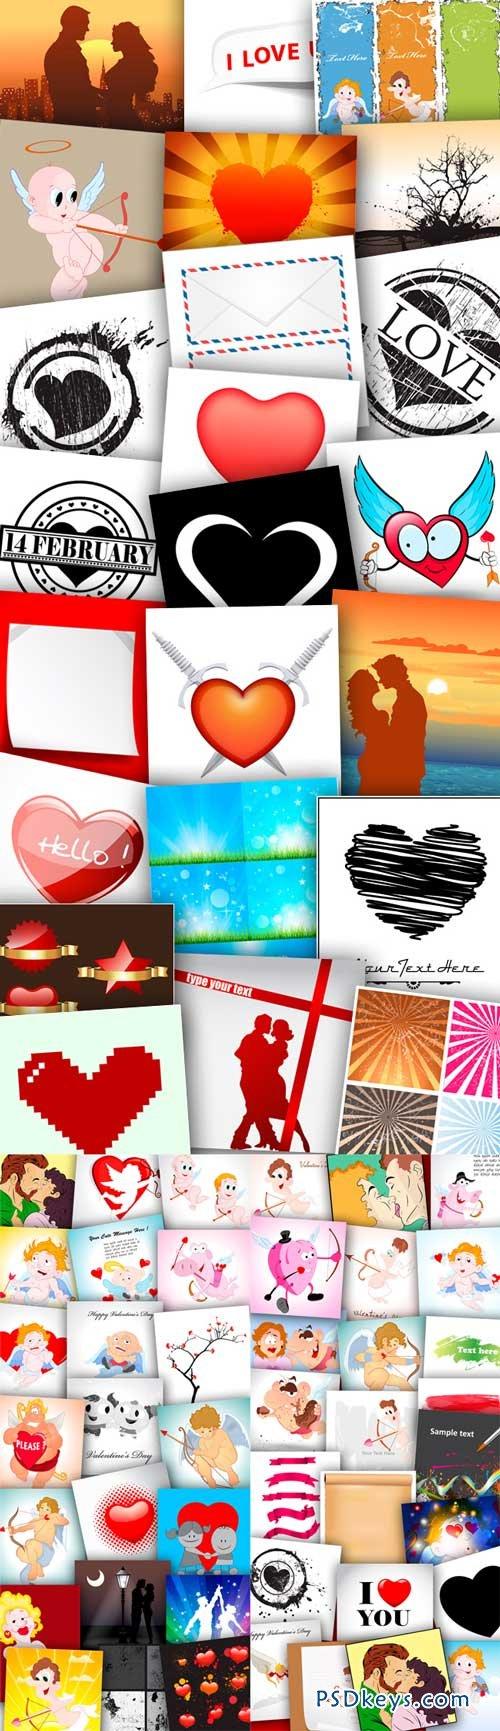 Over 250+ Valentines Graphic Bundle